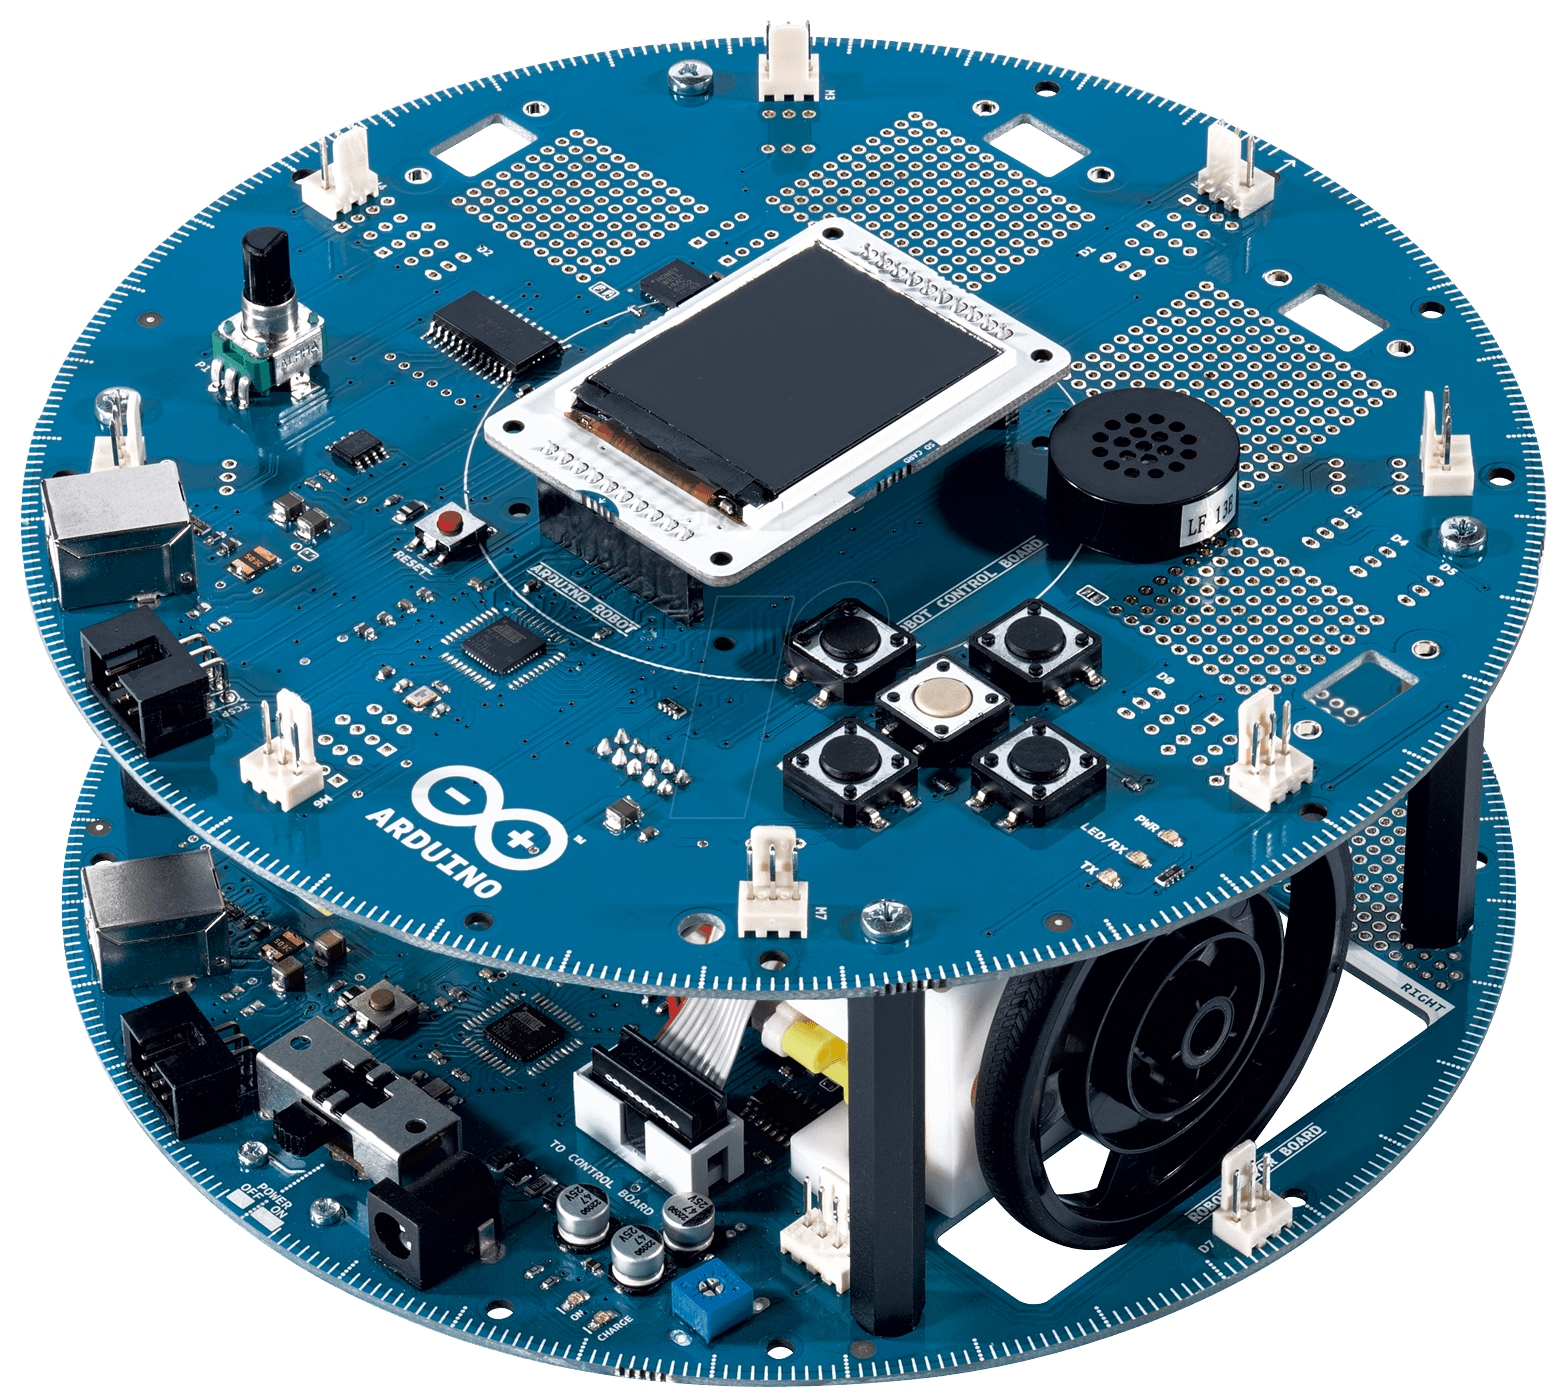 Zveme vás na gdg open hardware hackathon dotekománie cz